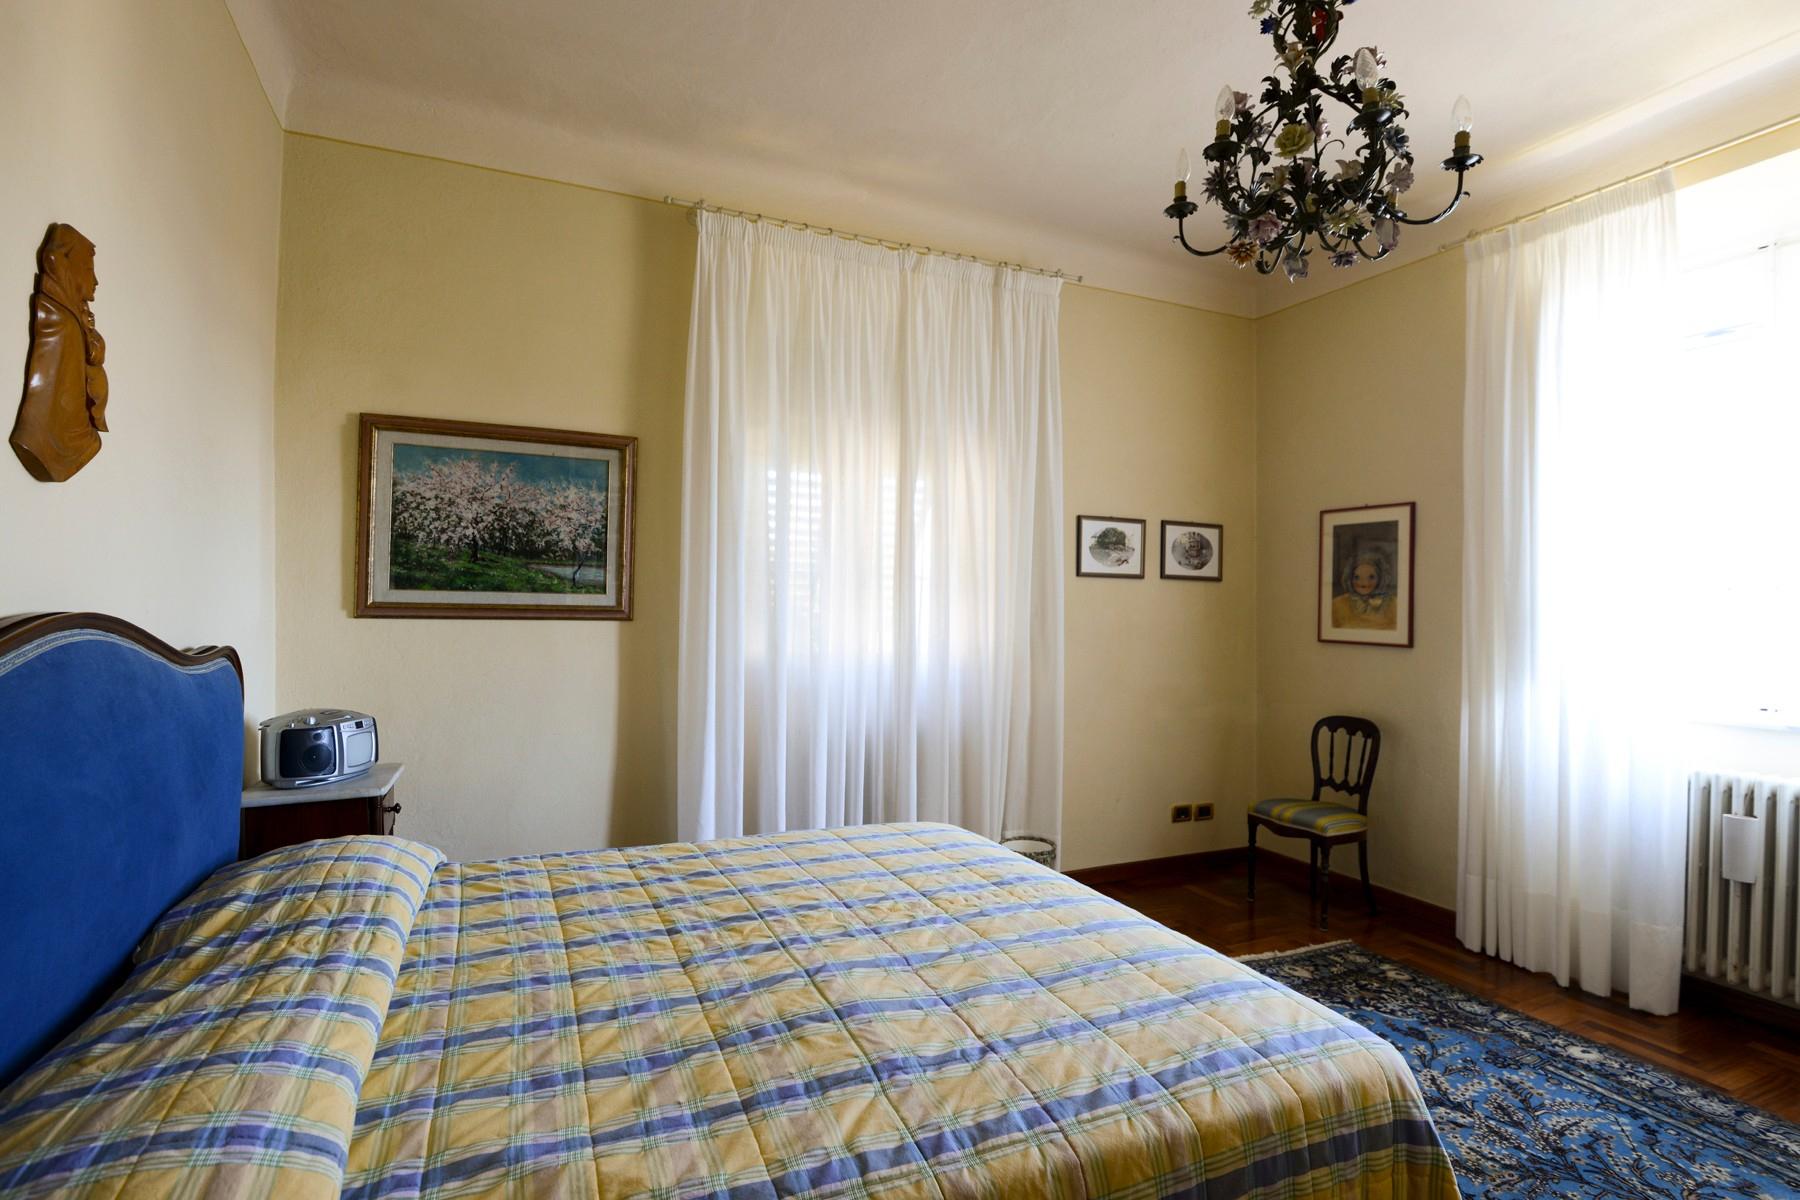 Villa in Vendita a Capannori: 5 locali, 376 mq - Foto 9